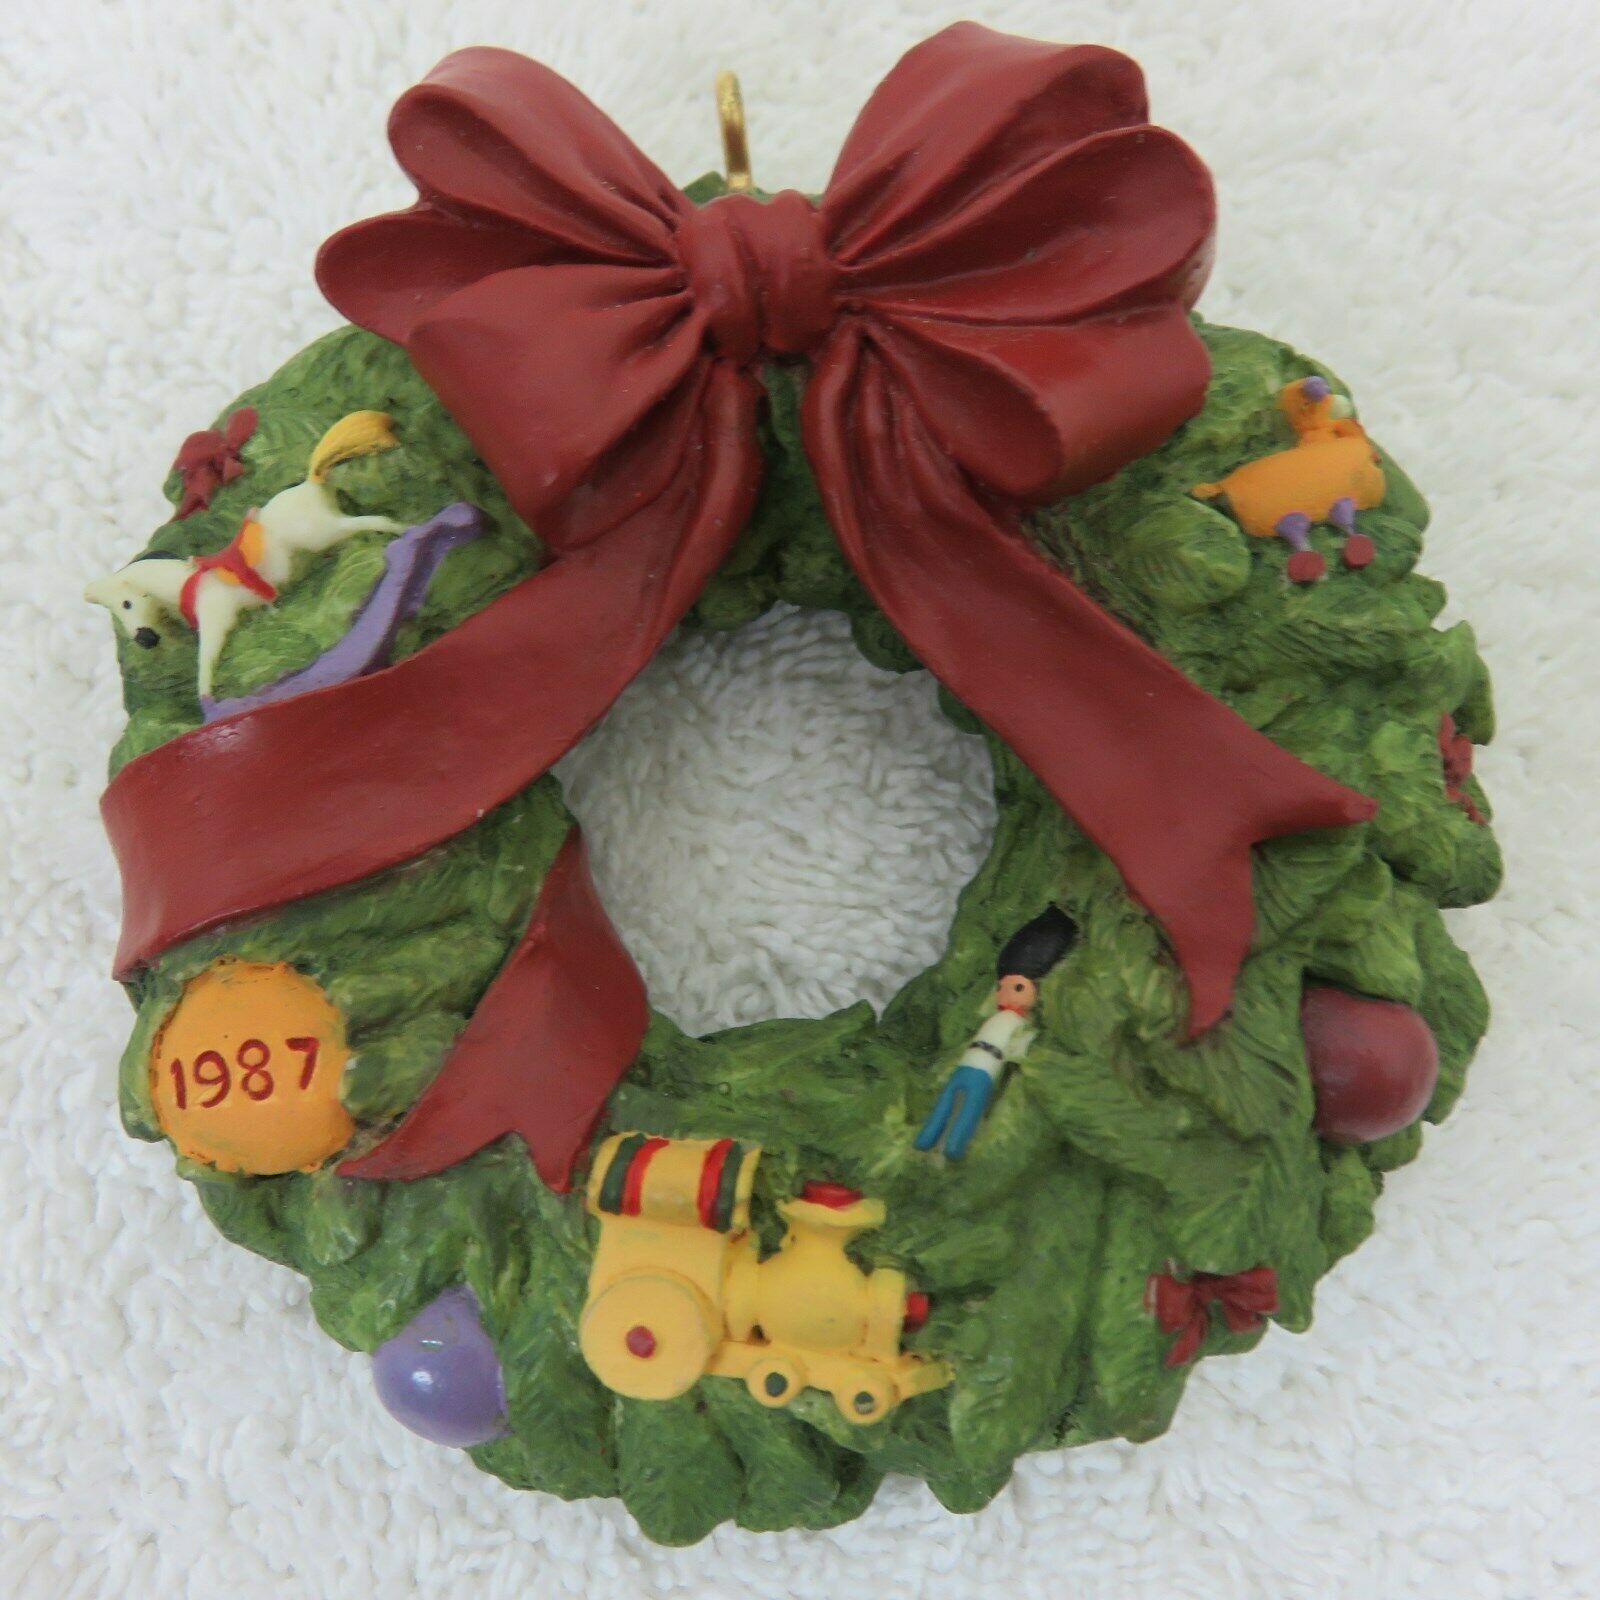 Vintage 1987 Hallmark Keepsake Ornament Wreath of Memories in Original Box